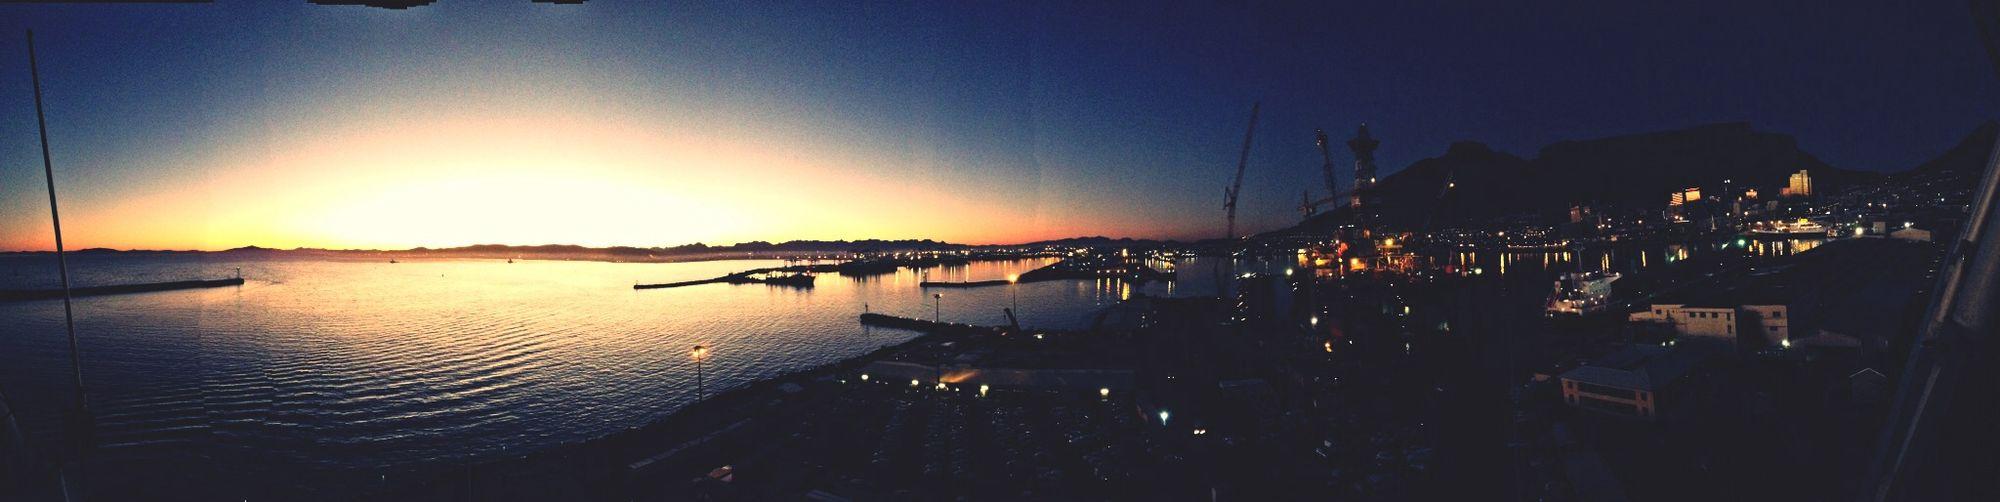 Morning Sunrise city skyline meets the sea